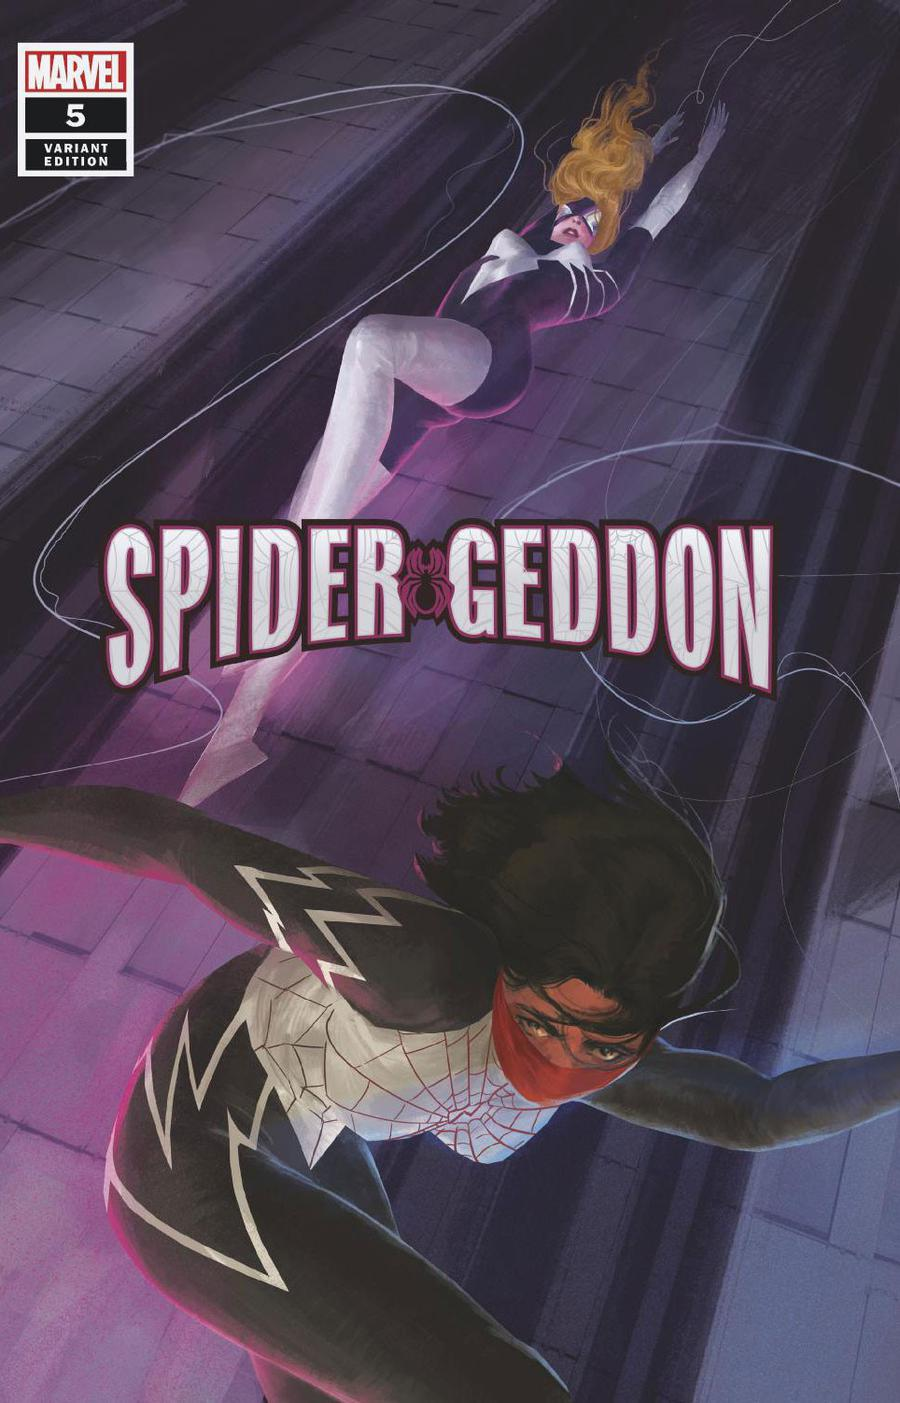 Spider-Geddon #5 Cover D Incentive Vanessa Del Rey Variant Cover (Spider-Geddon Tie-In)